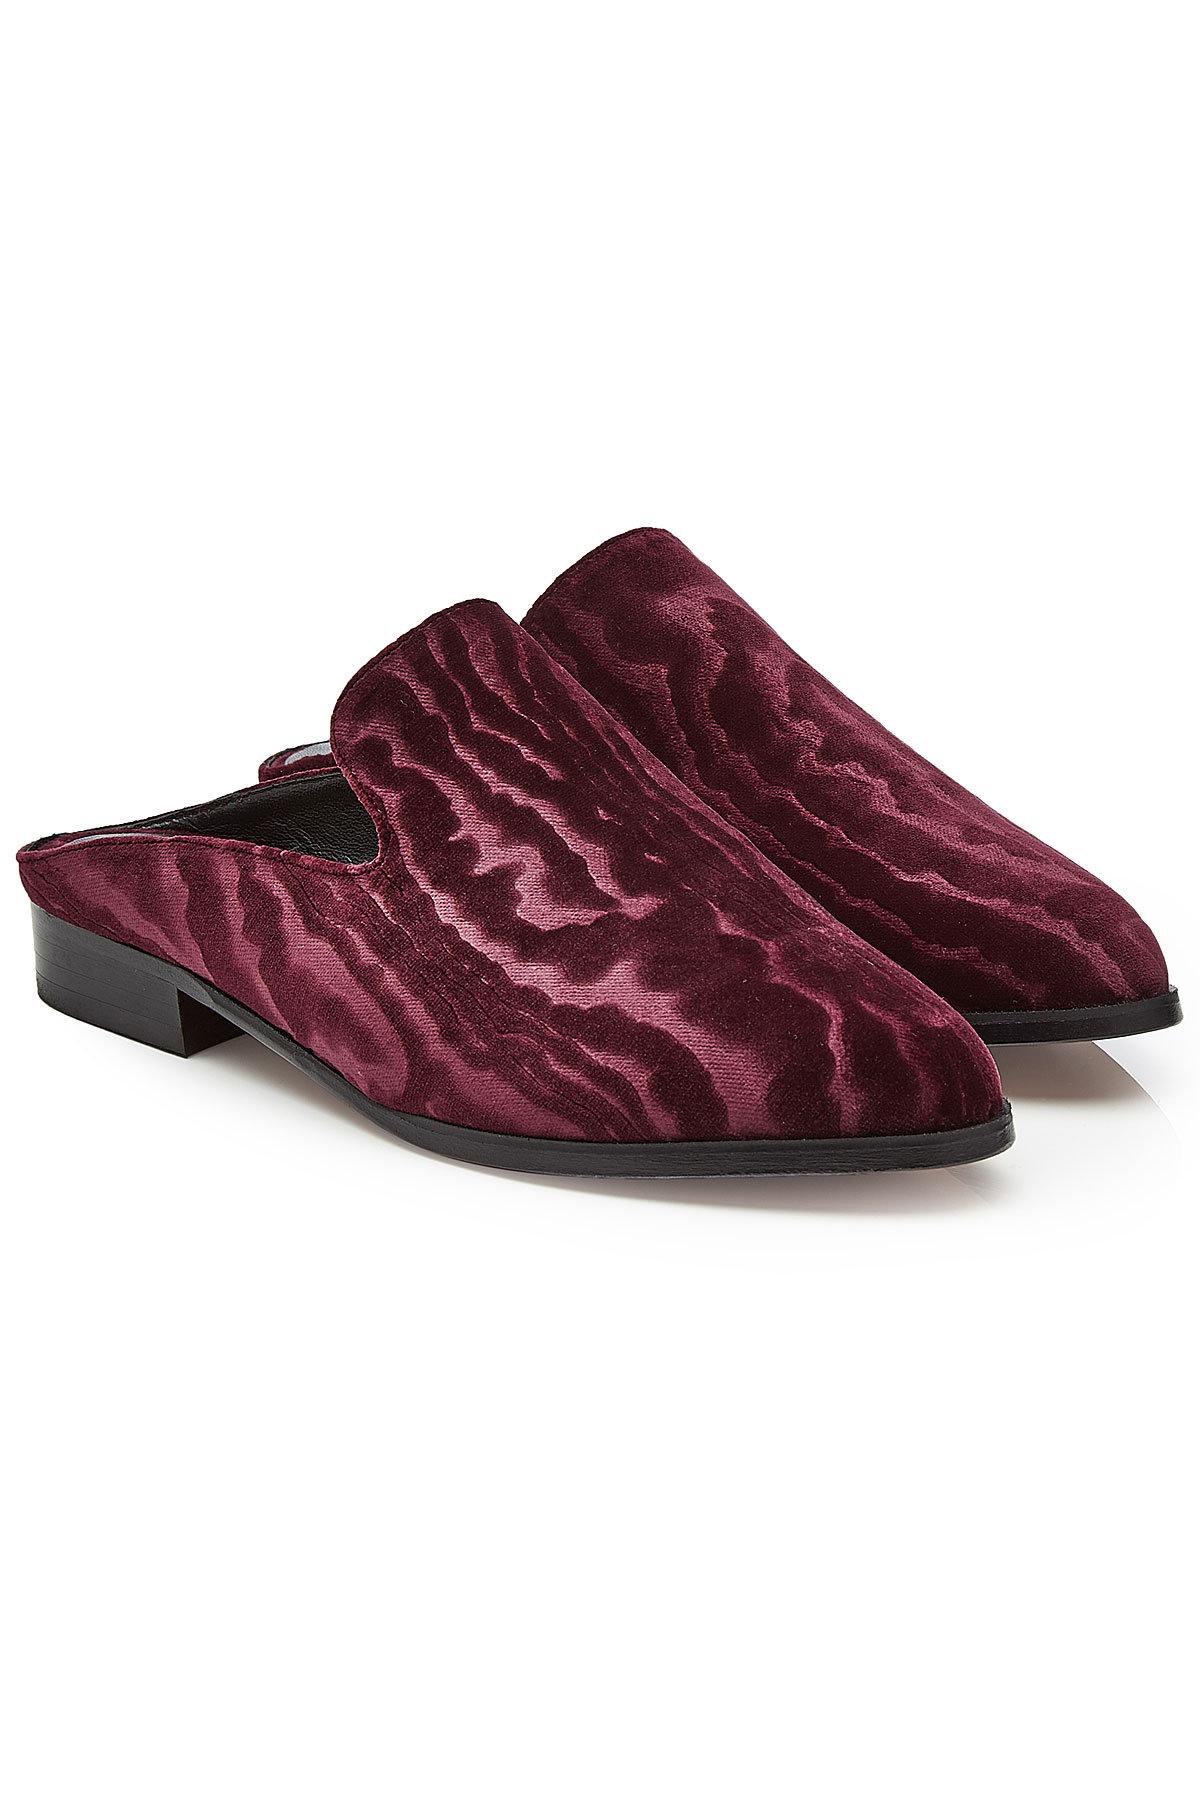 Robert Clergerie Woven Slip-On Loafers Gr. IT 39.5 dxrgNTnq